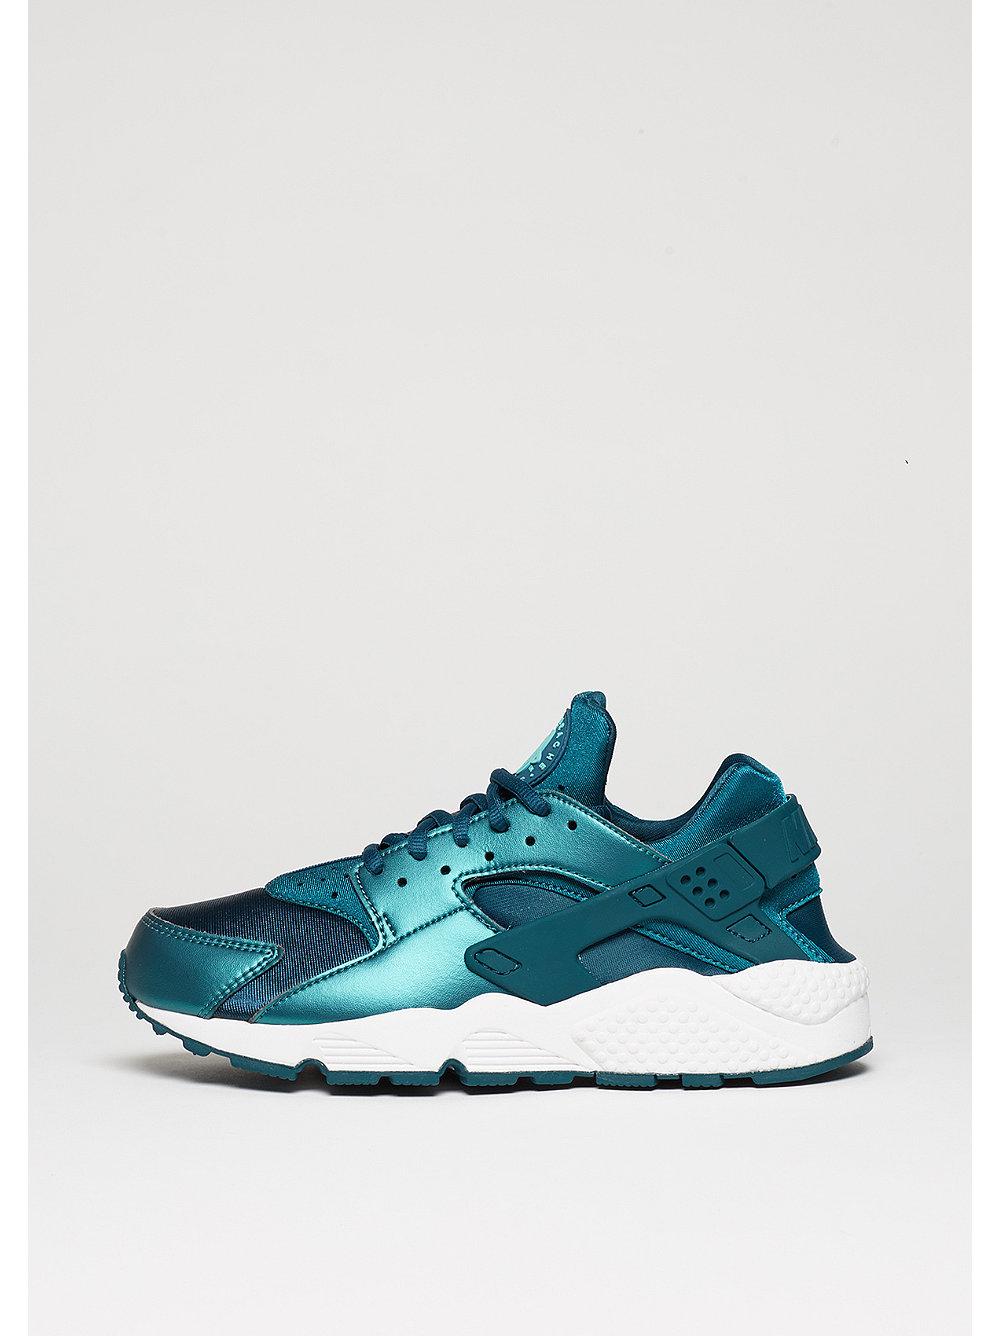 Nike Air Huarache Run damessneaker zilver, groen en blauw